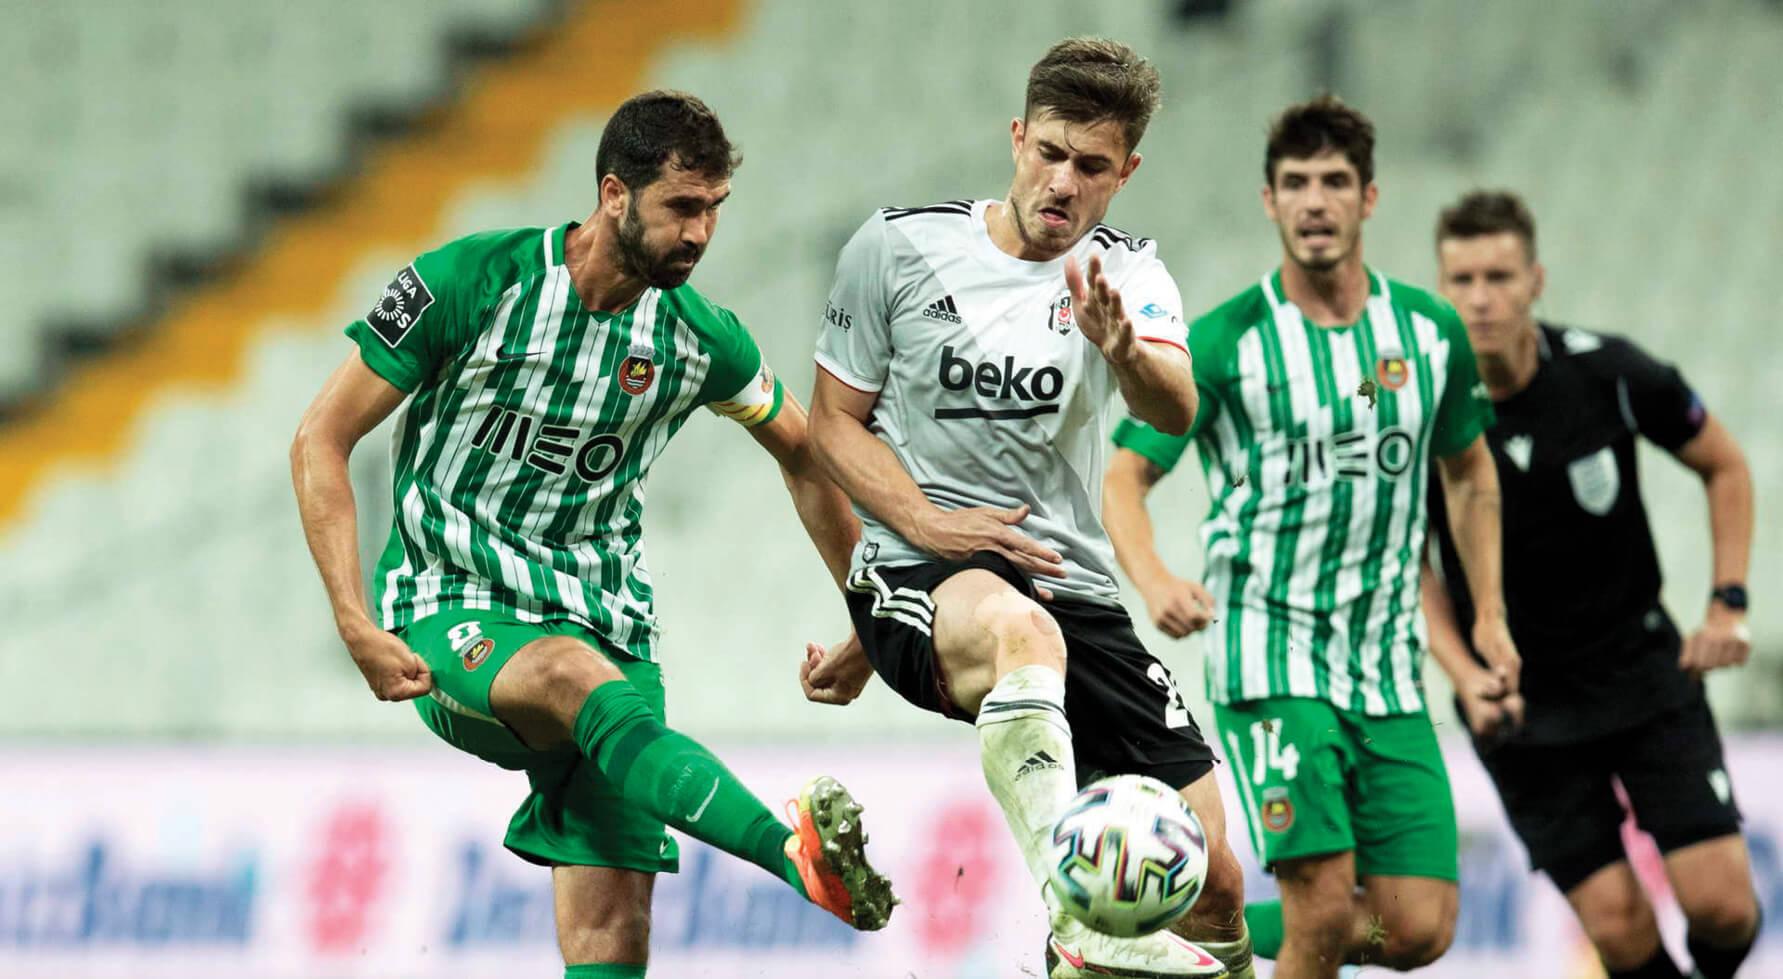 Rio Ave garante play-off na Liga Europa nos penáltis - milenio stadium - portugal